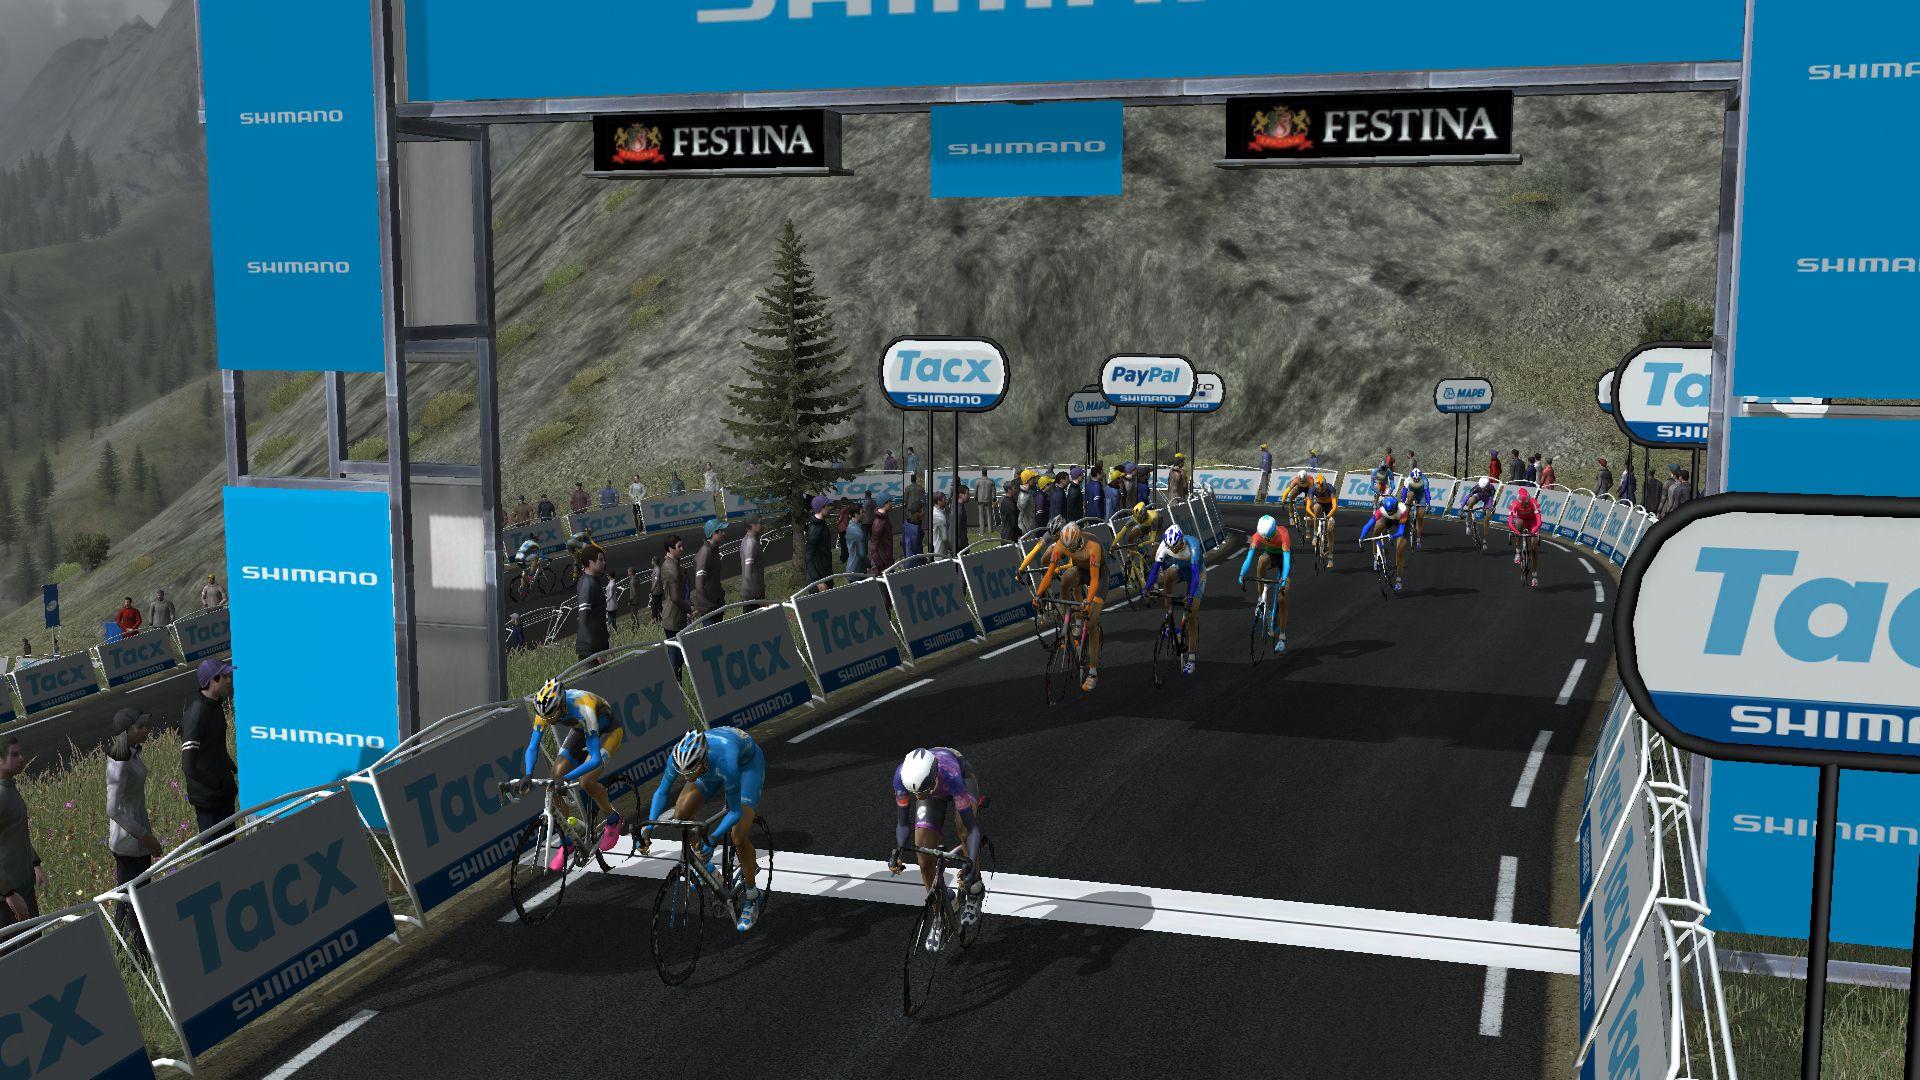 pcmdaily.com/images/mg/2017/Races/CT/Trentino/mg2017_trentino_05_PCM0090.jpg